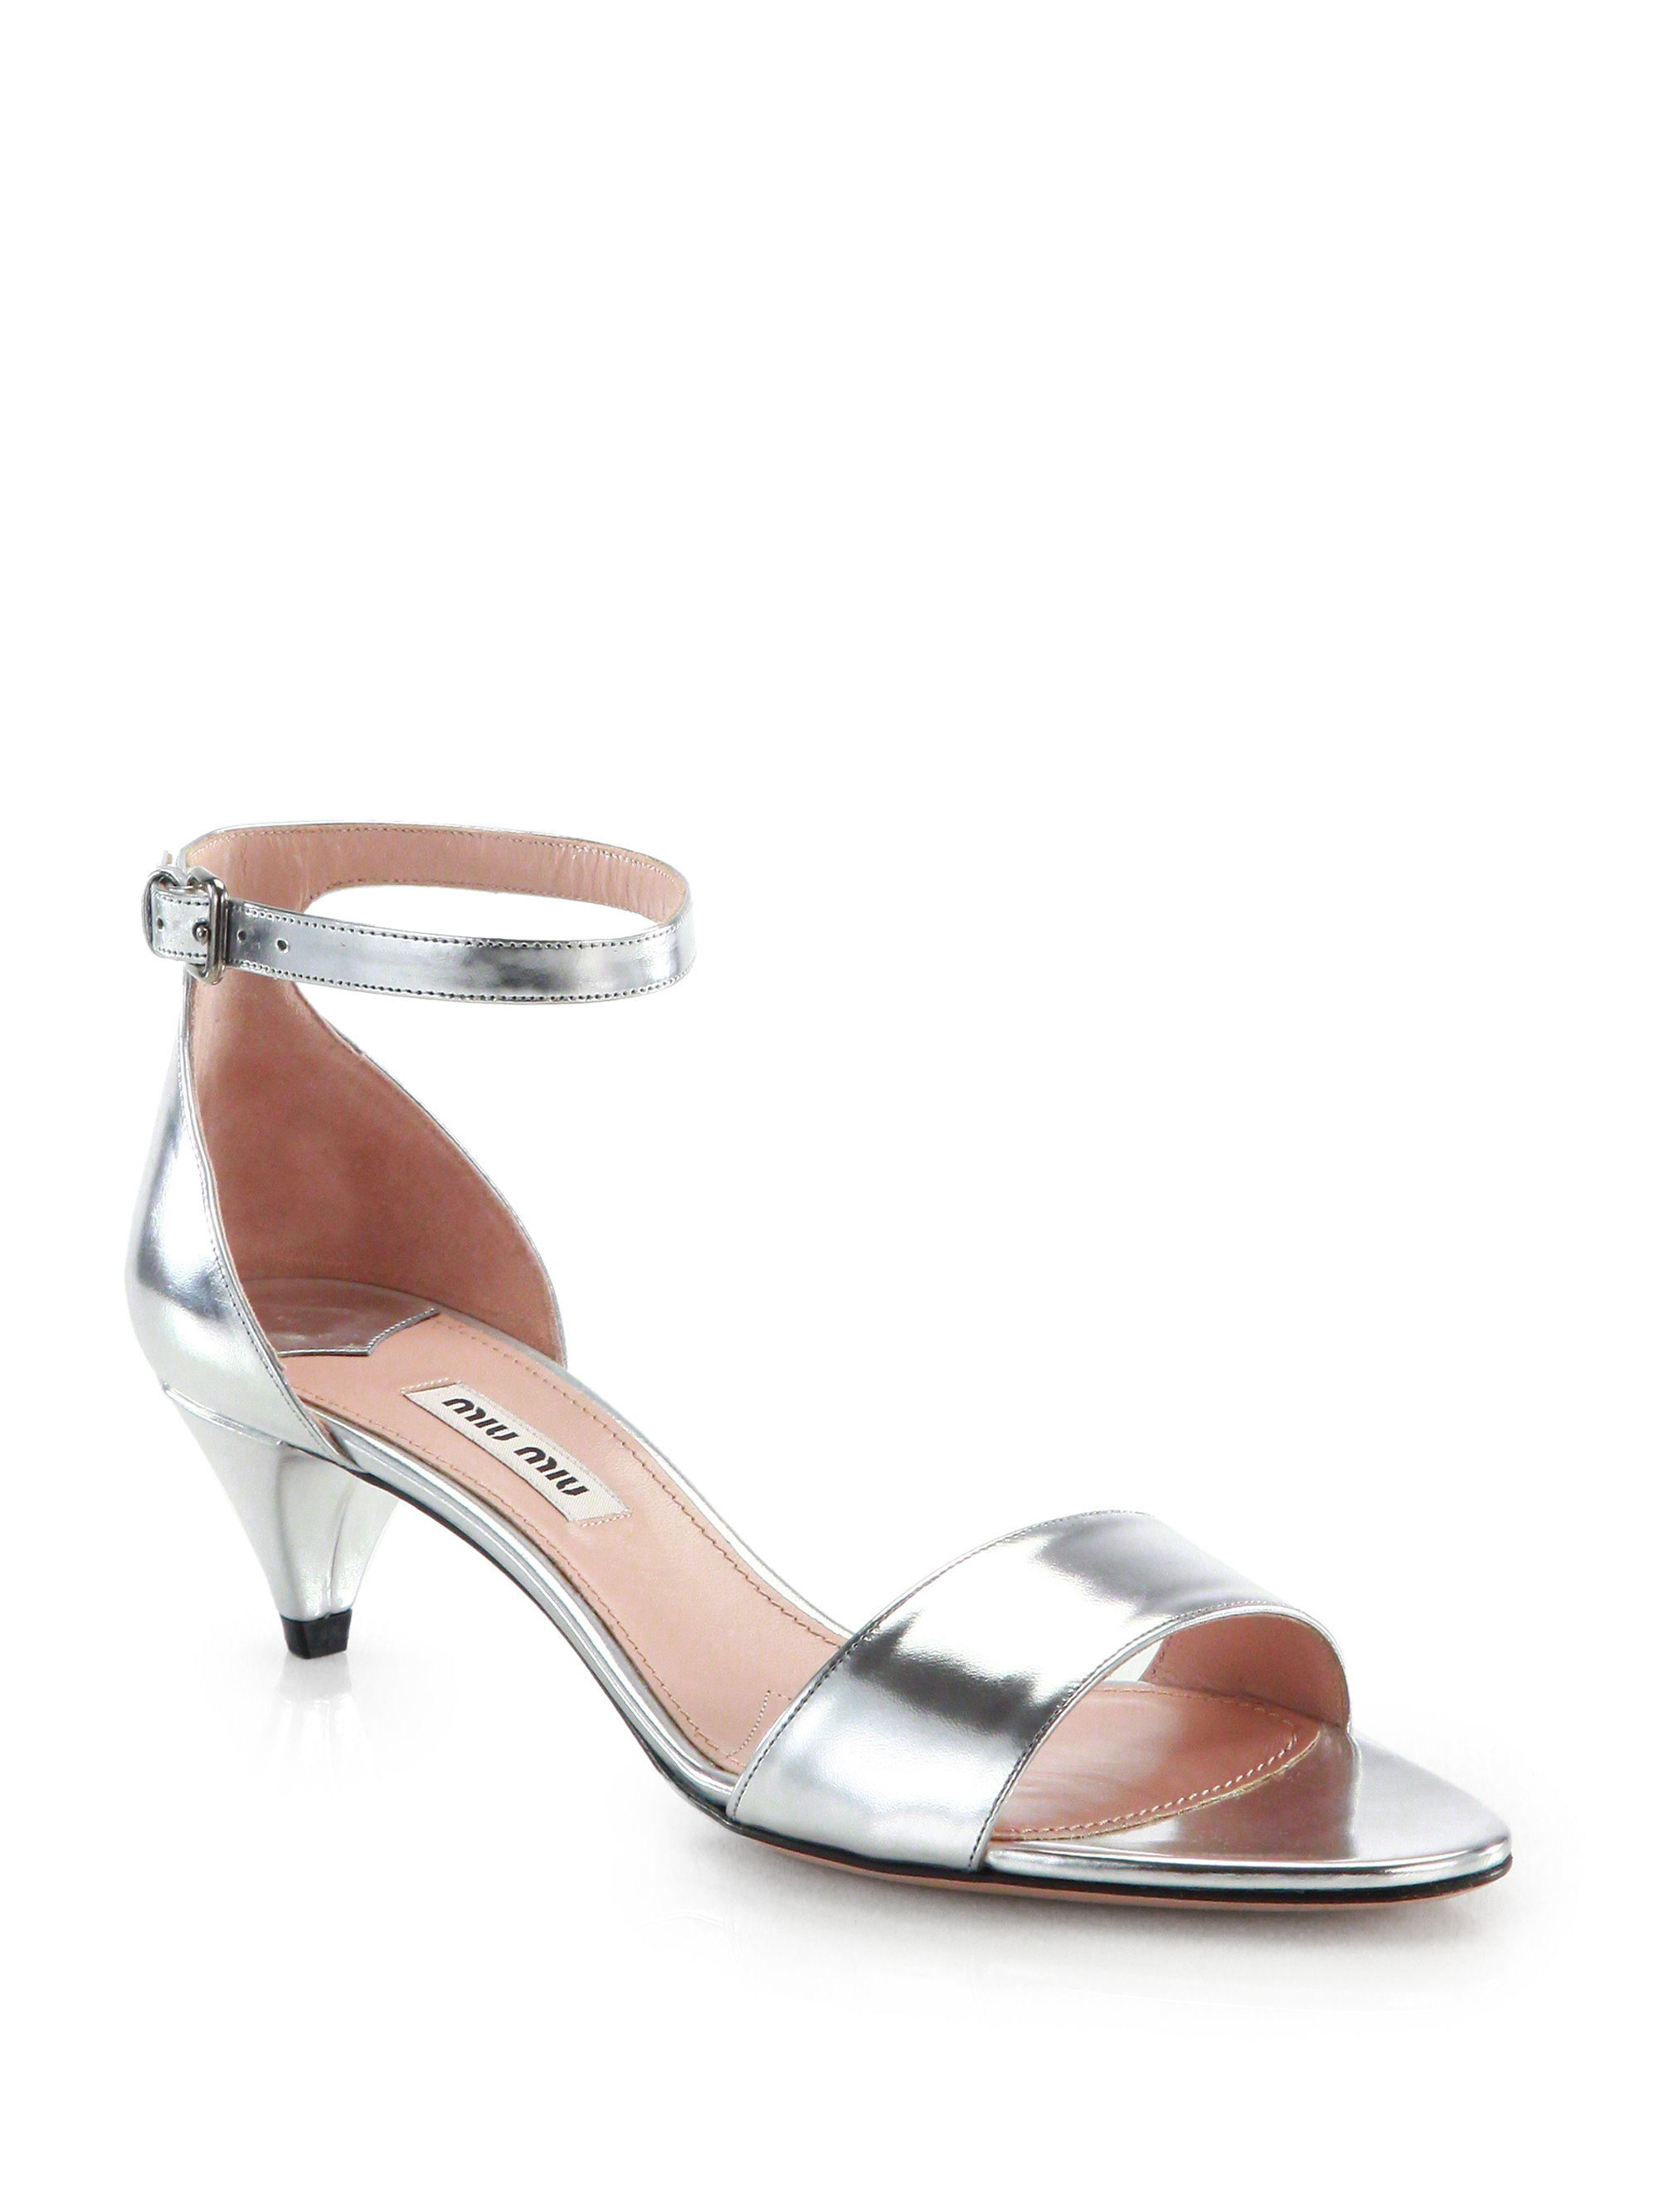 Lyst - Miu Miu Metallic Leather Kitten-Heel Sandals in Metallic